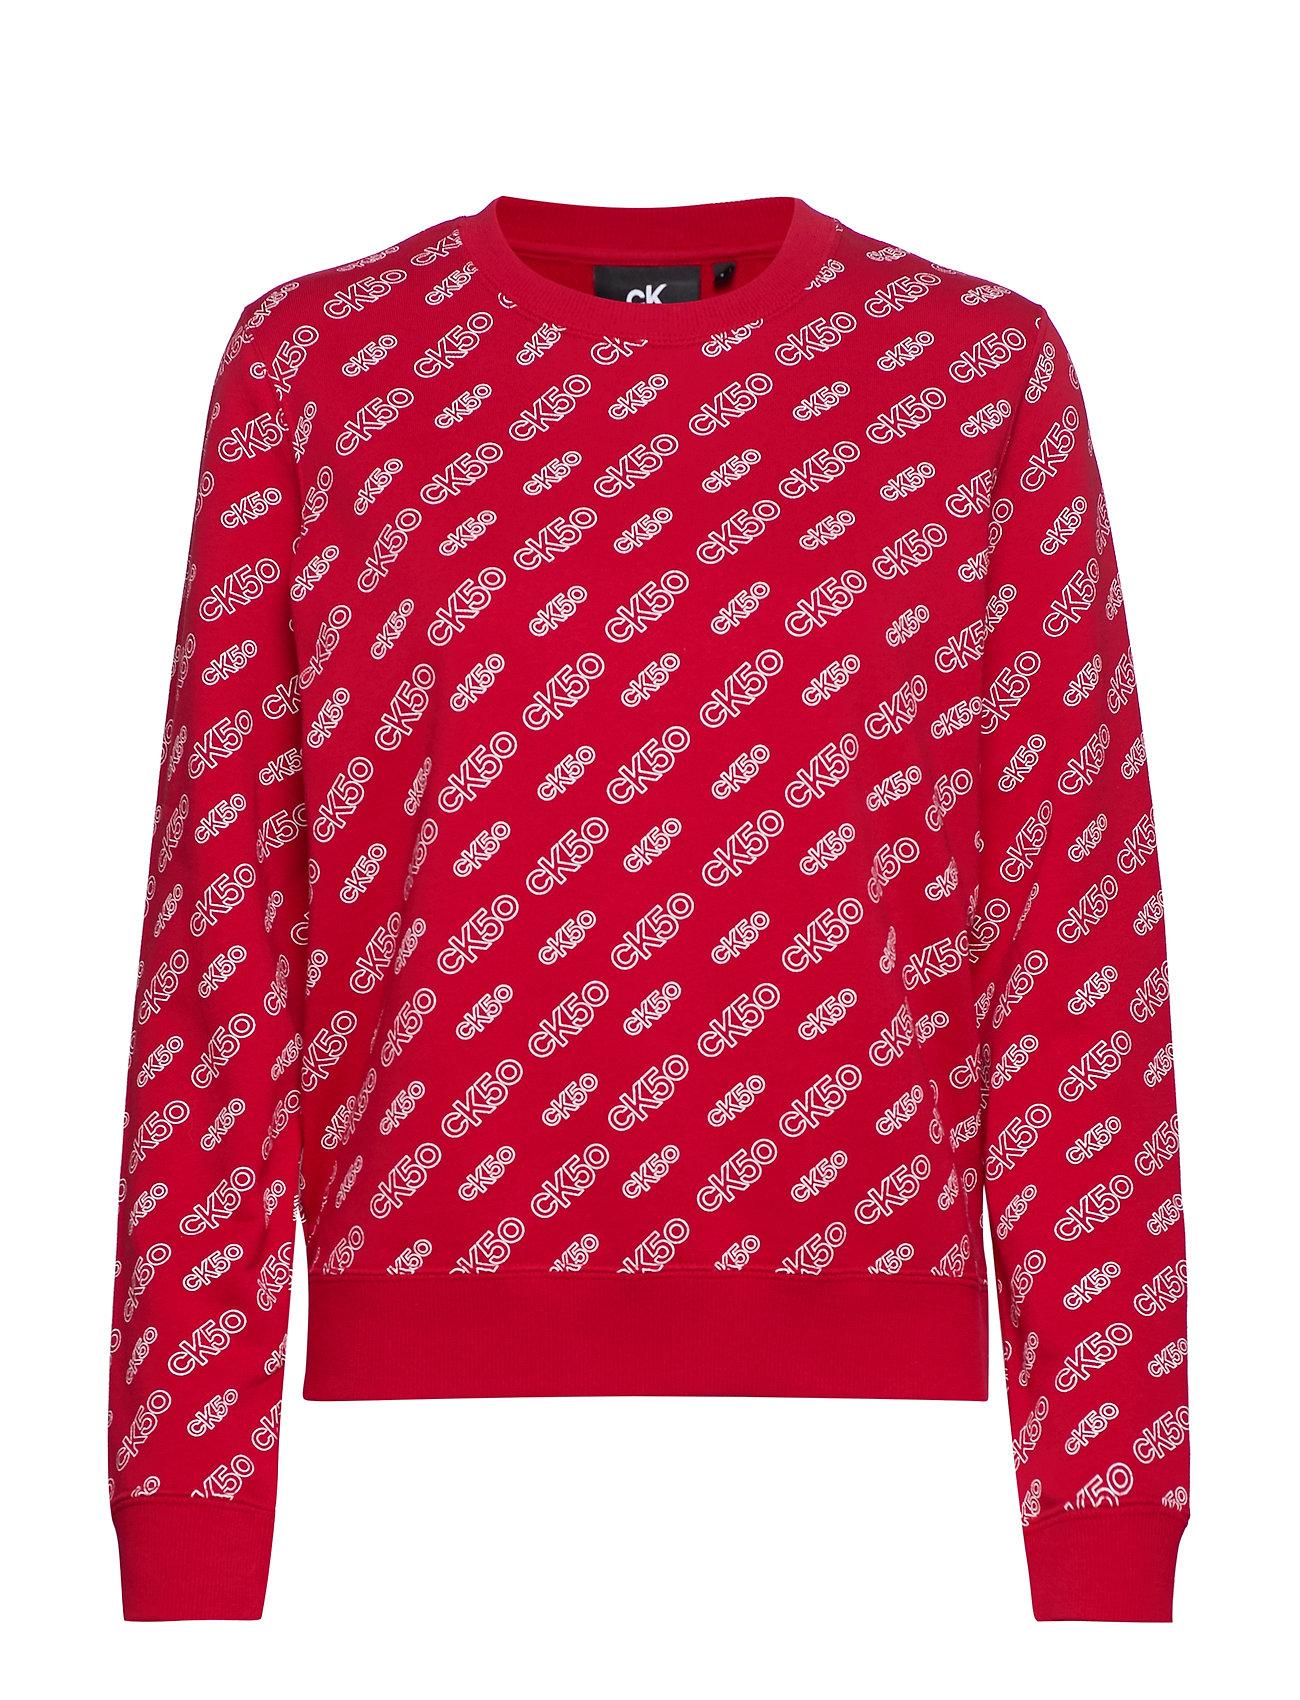 Calvin Klein Jeans AOP CN REGULAR HWK - CK50 AOP RED/ WHITE LOGO